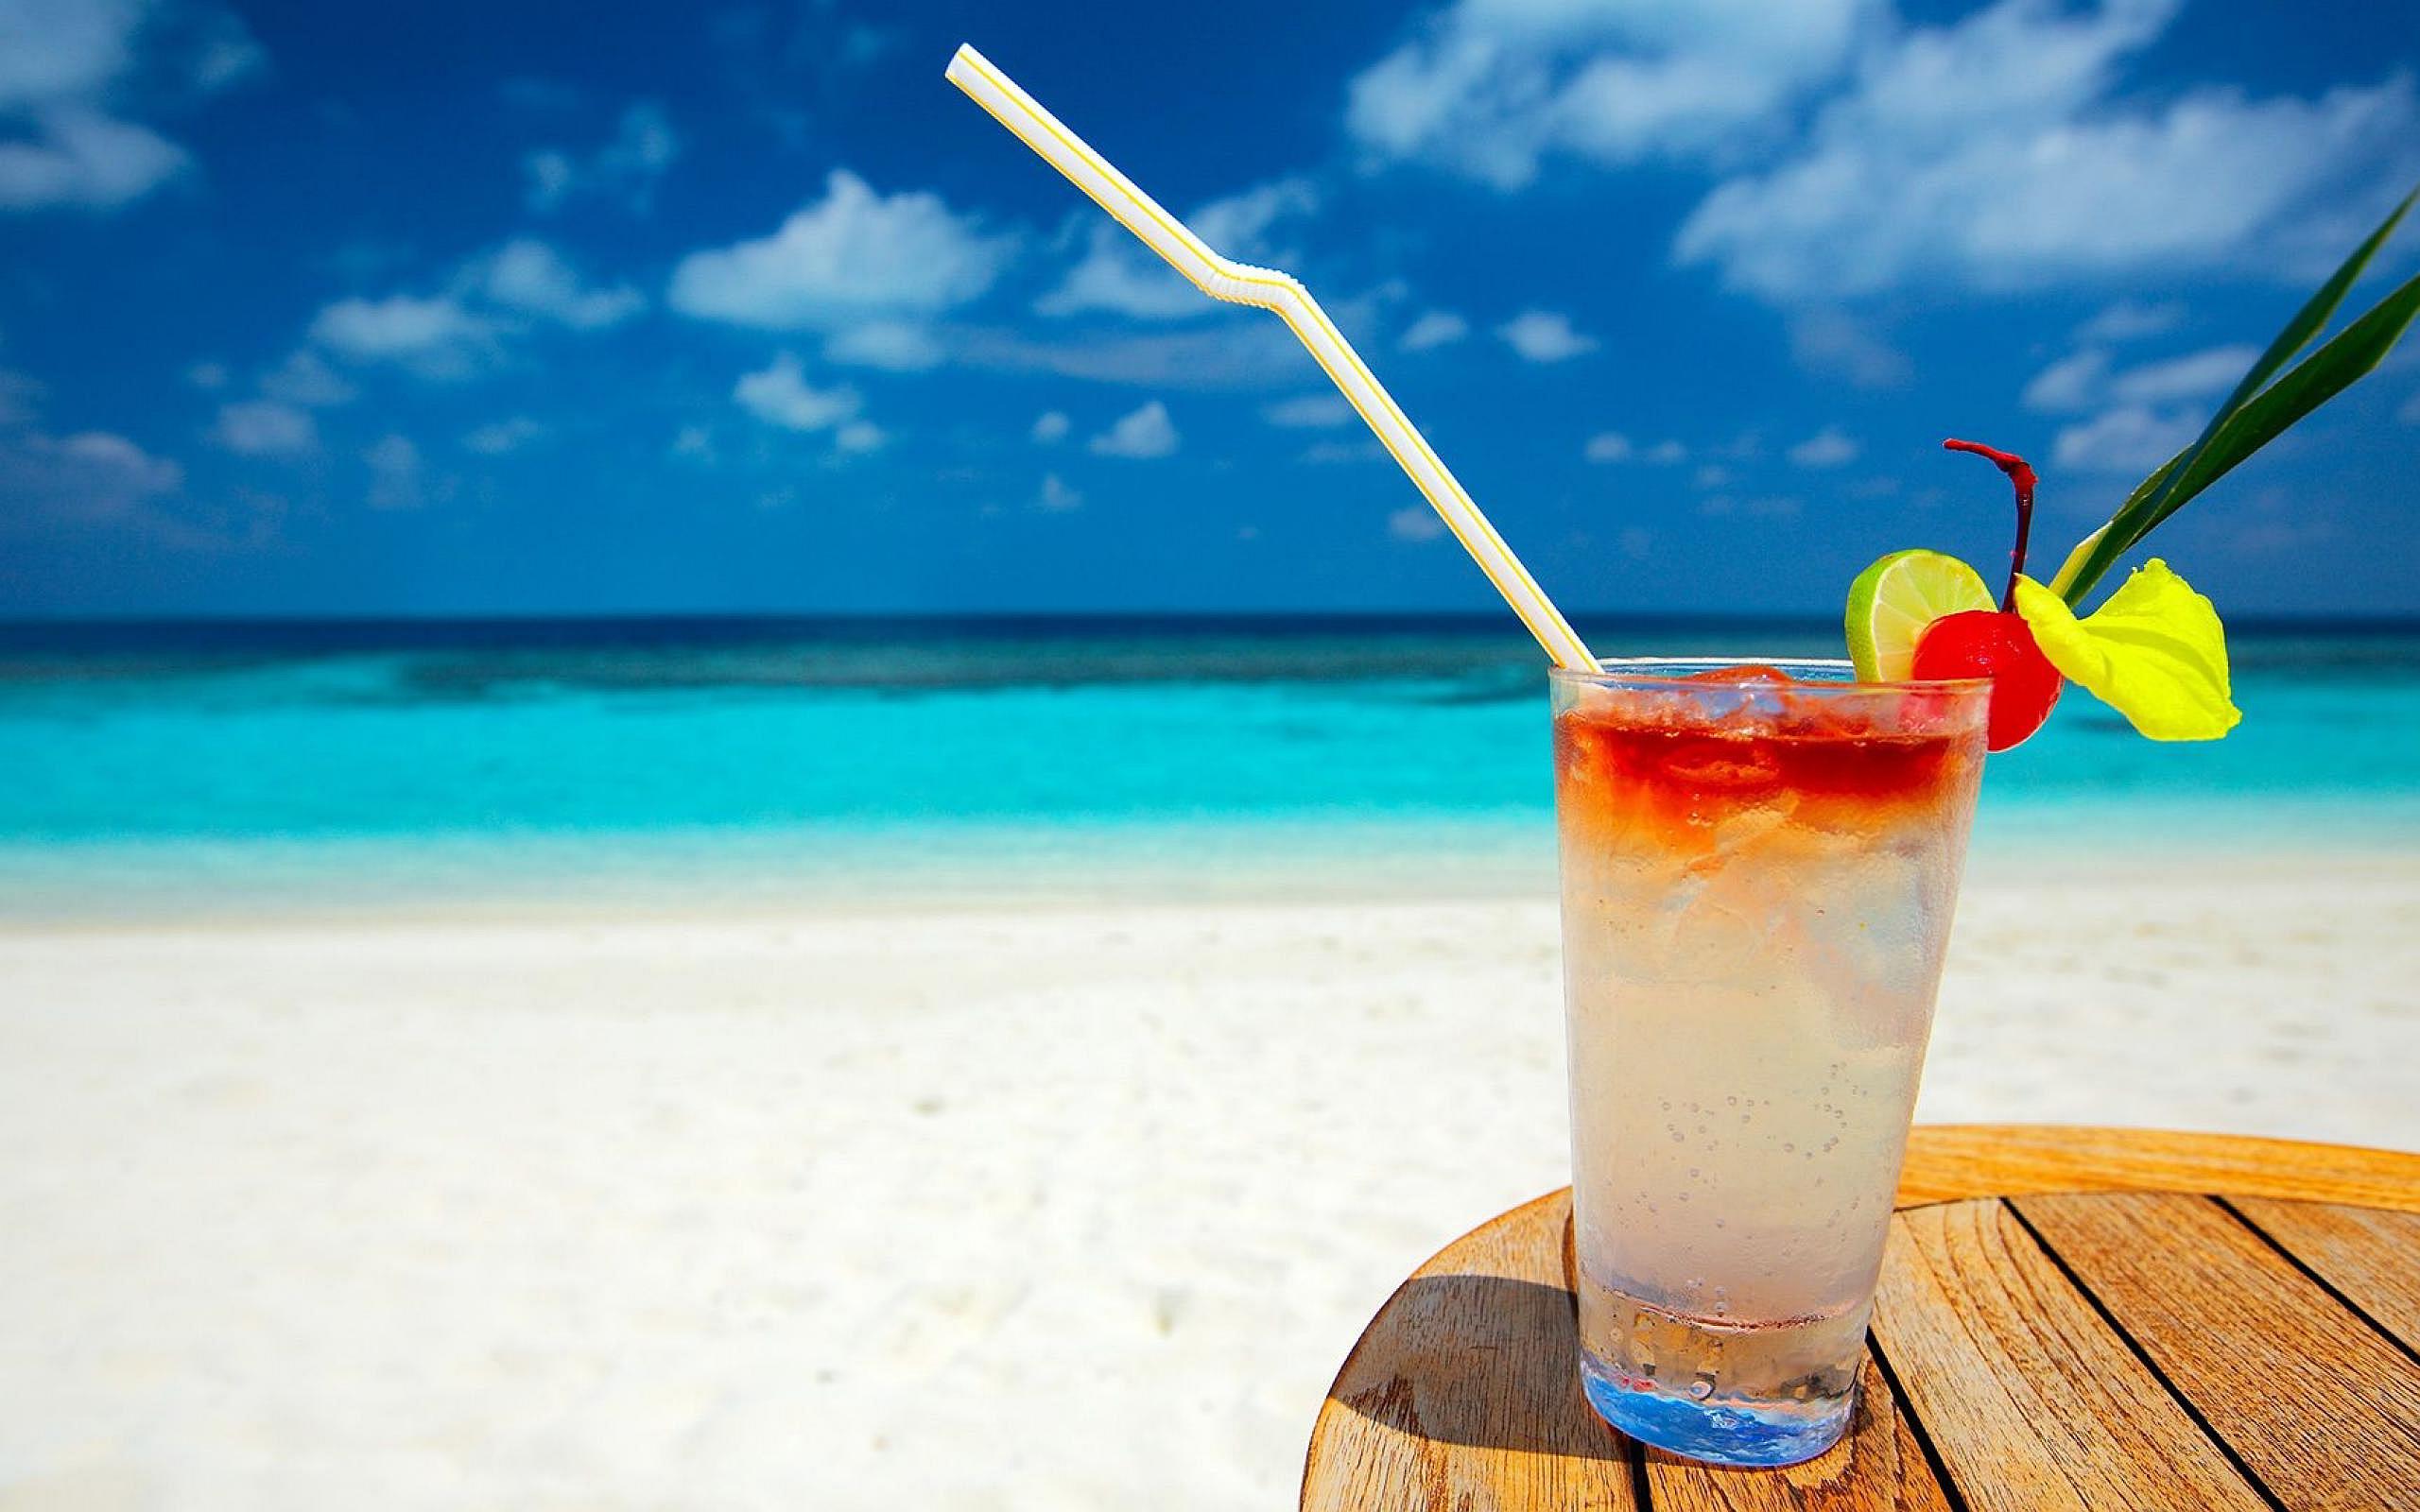 beach scenes wallpaper With Resolutions 25601600 Pixel 2560x1600